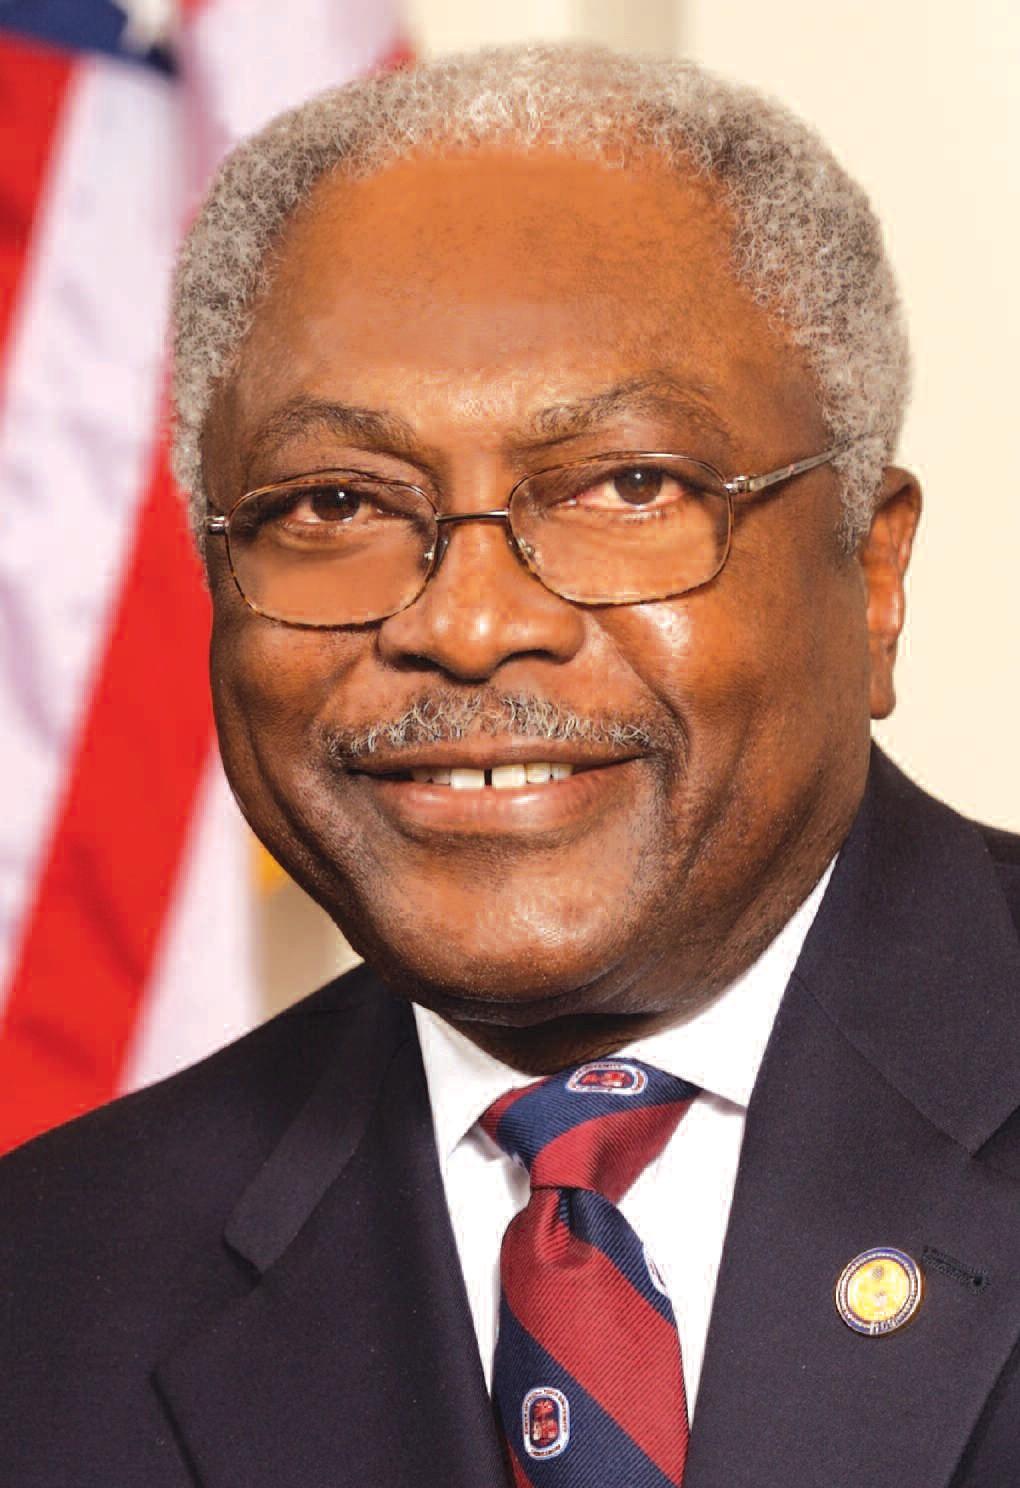 Rep. James Clyburn